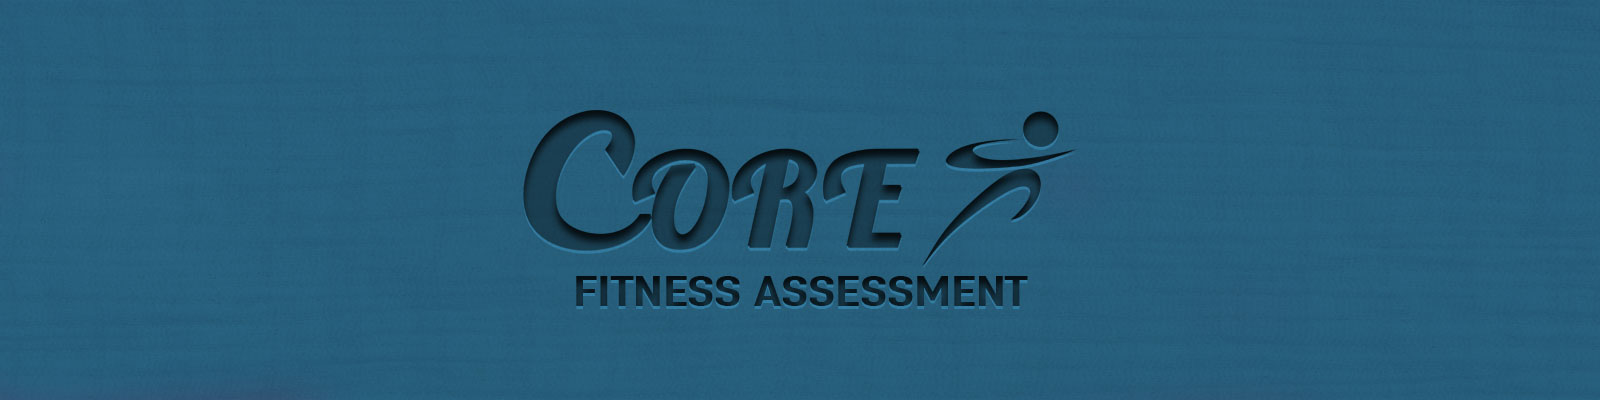 Core Health & Fitness - Gym Durrow Co. Laois